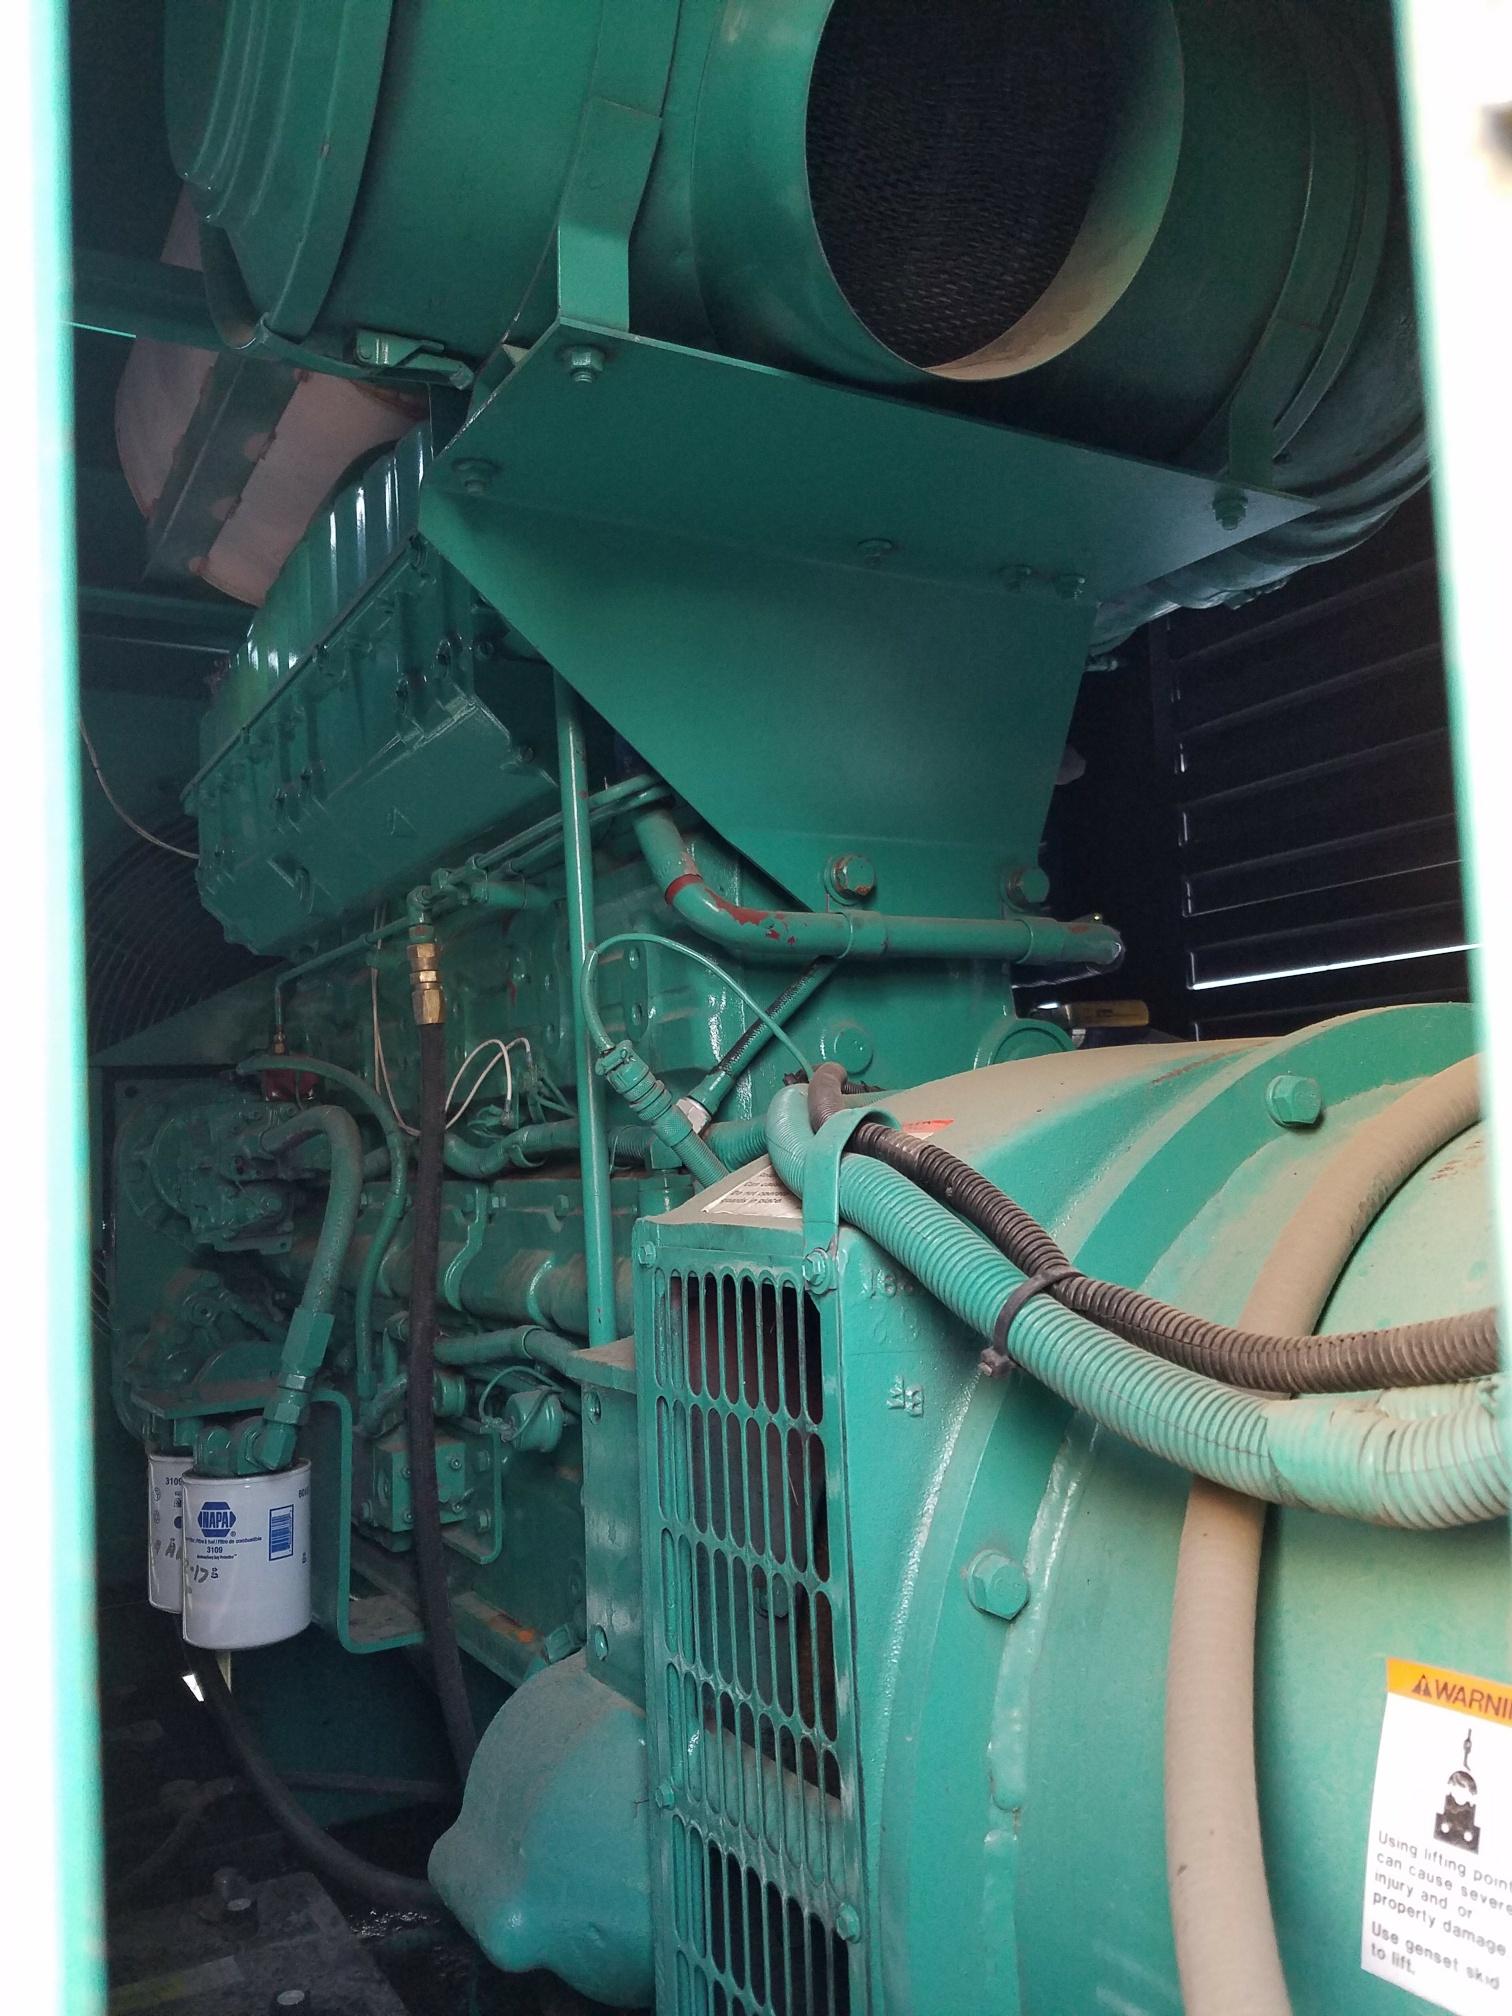 Unit 88 an Cummins 350kW Standby Diesel Generator 277 480v 3